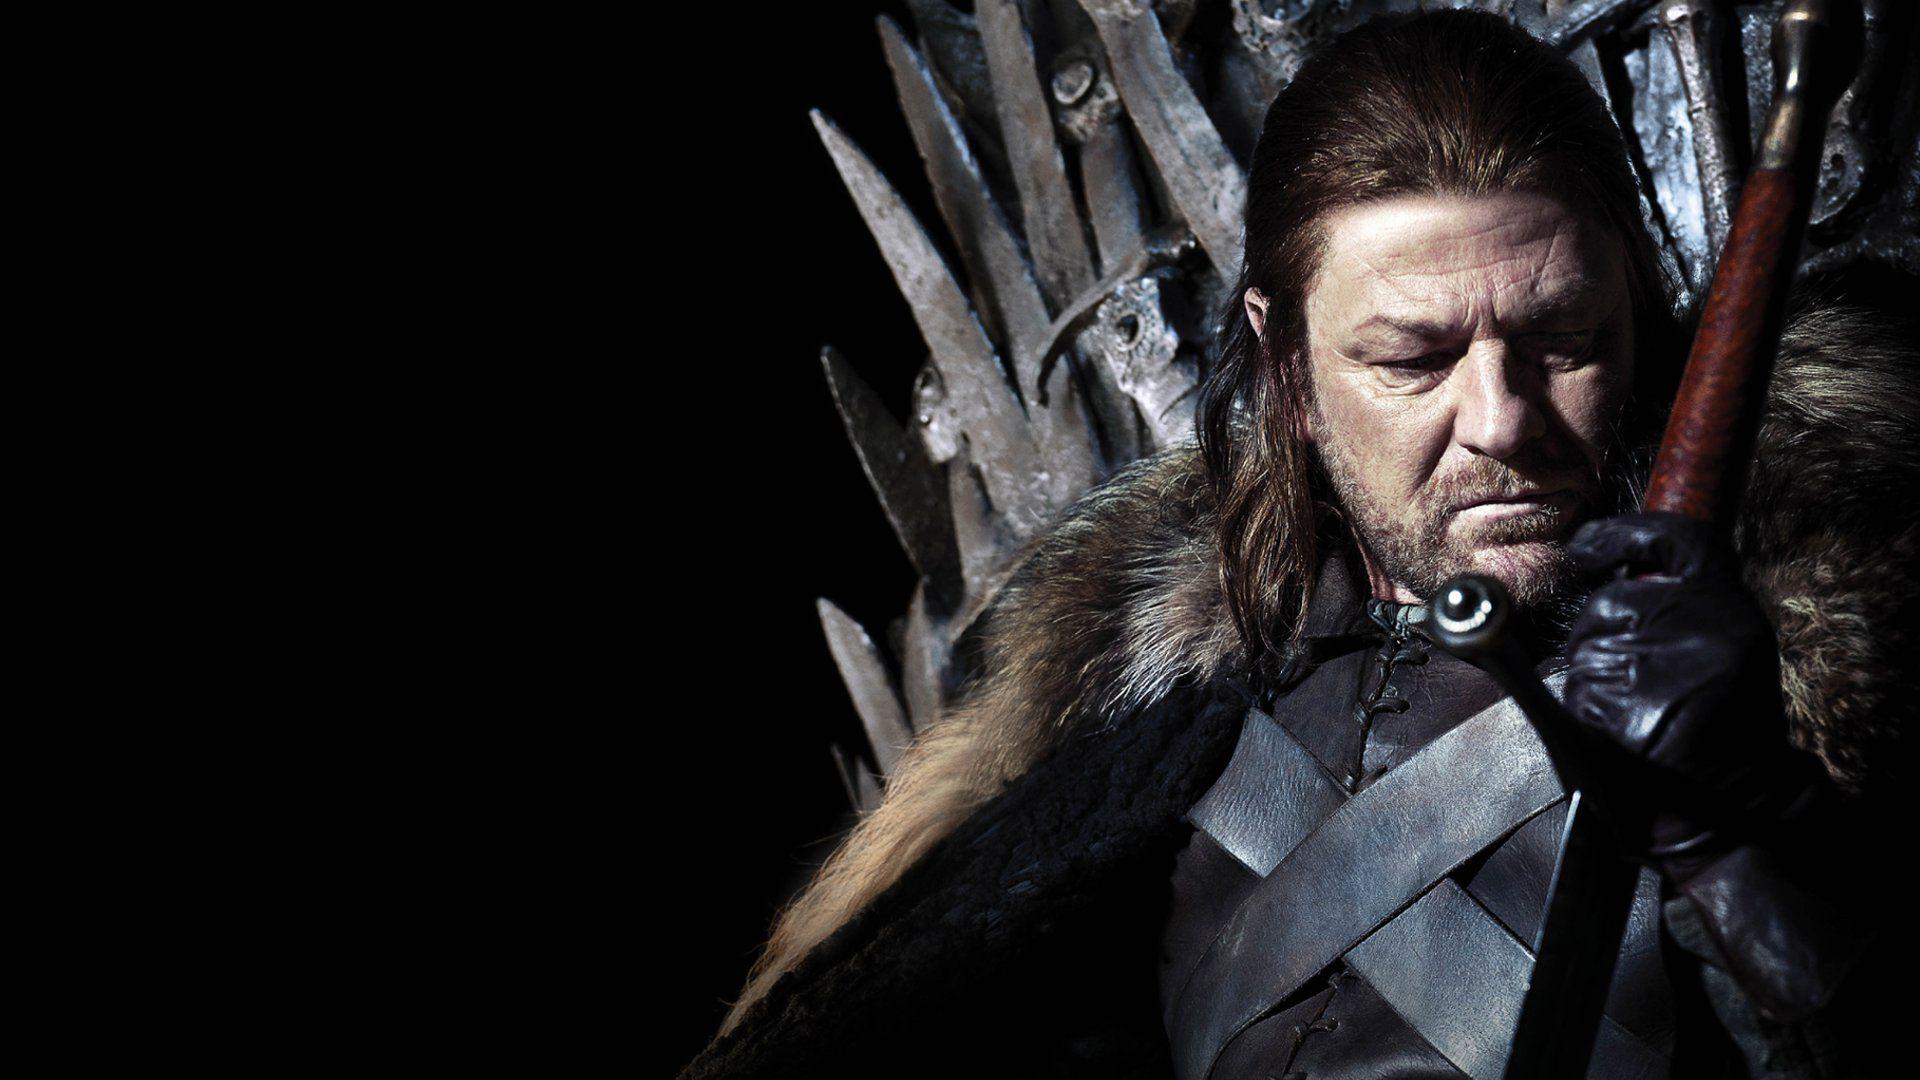 Game of Thrones dark wallpaper